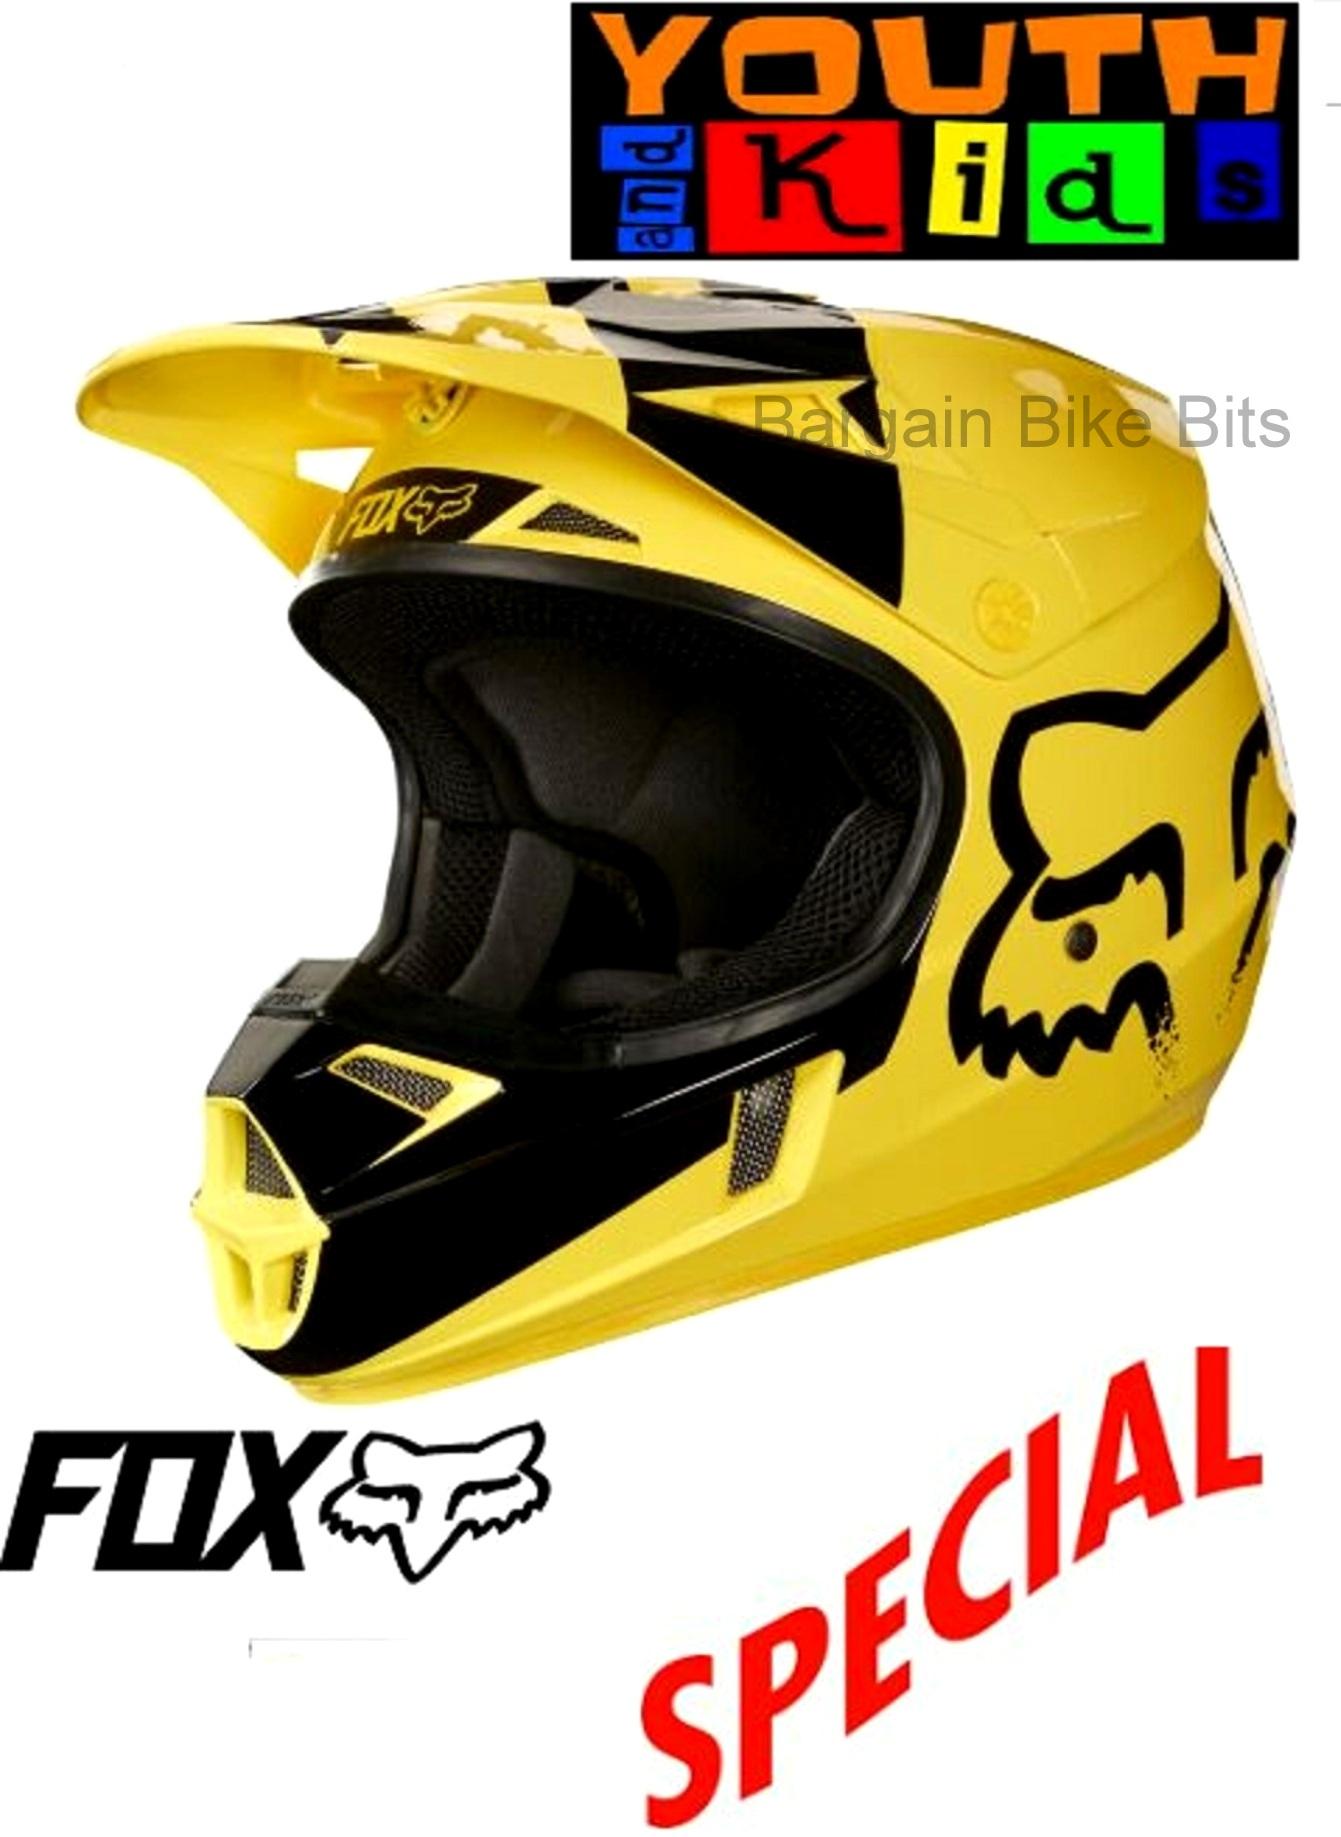 Kids Fox Helmet Off 59 Www Abrafiltros Org Br